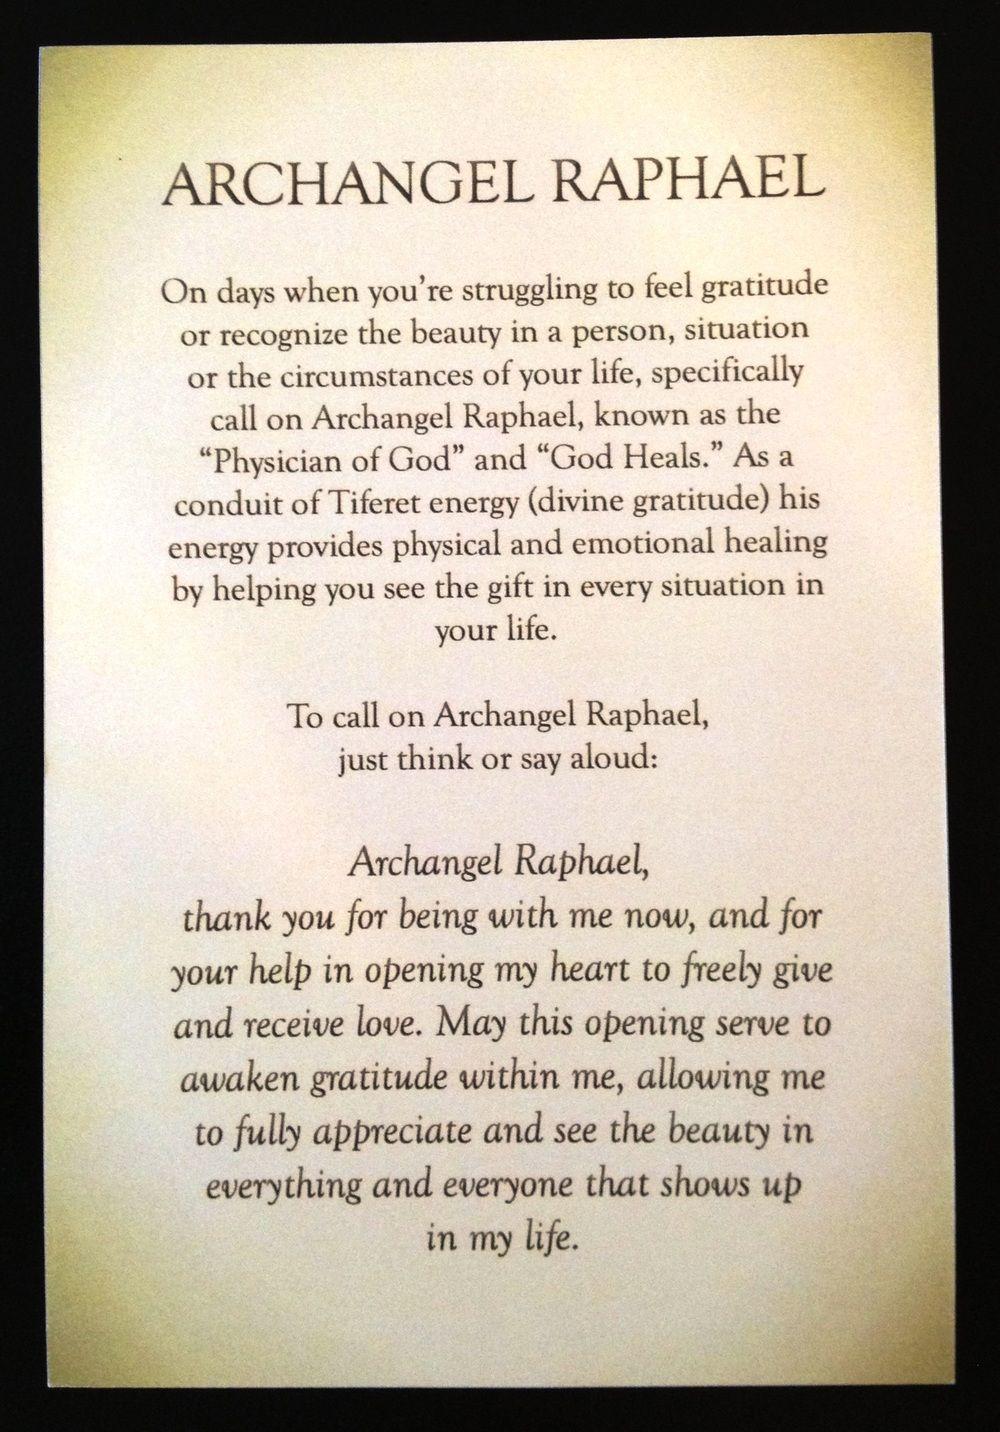 A short prayermeditation for archangel raphael by rebecca rosen a short prayermeditation for archangel raphael by rebecca rosen buycottarizona Images